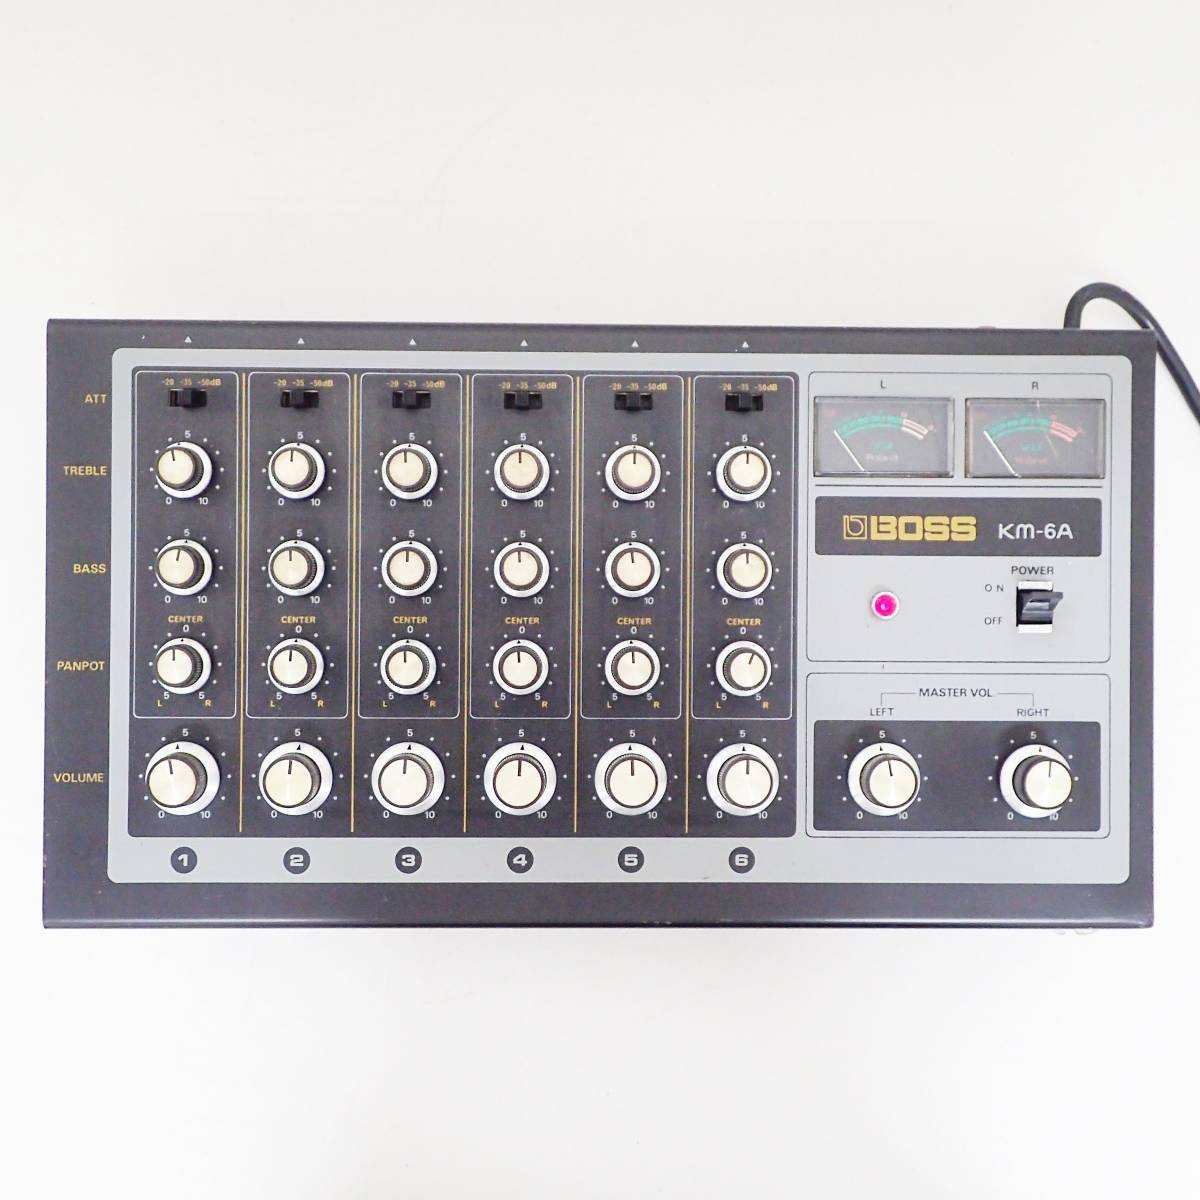 BOSS mixer KM-6A アナログ ミキサー Roland ローランド 通電確認済み  B01